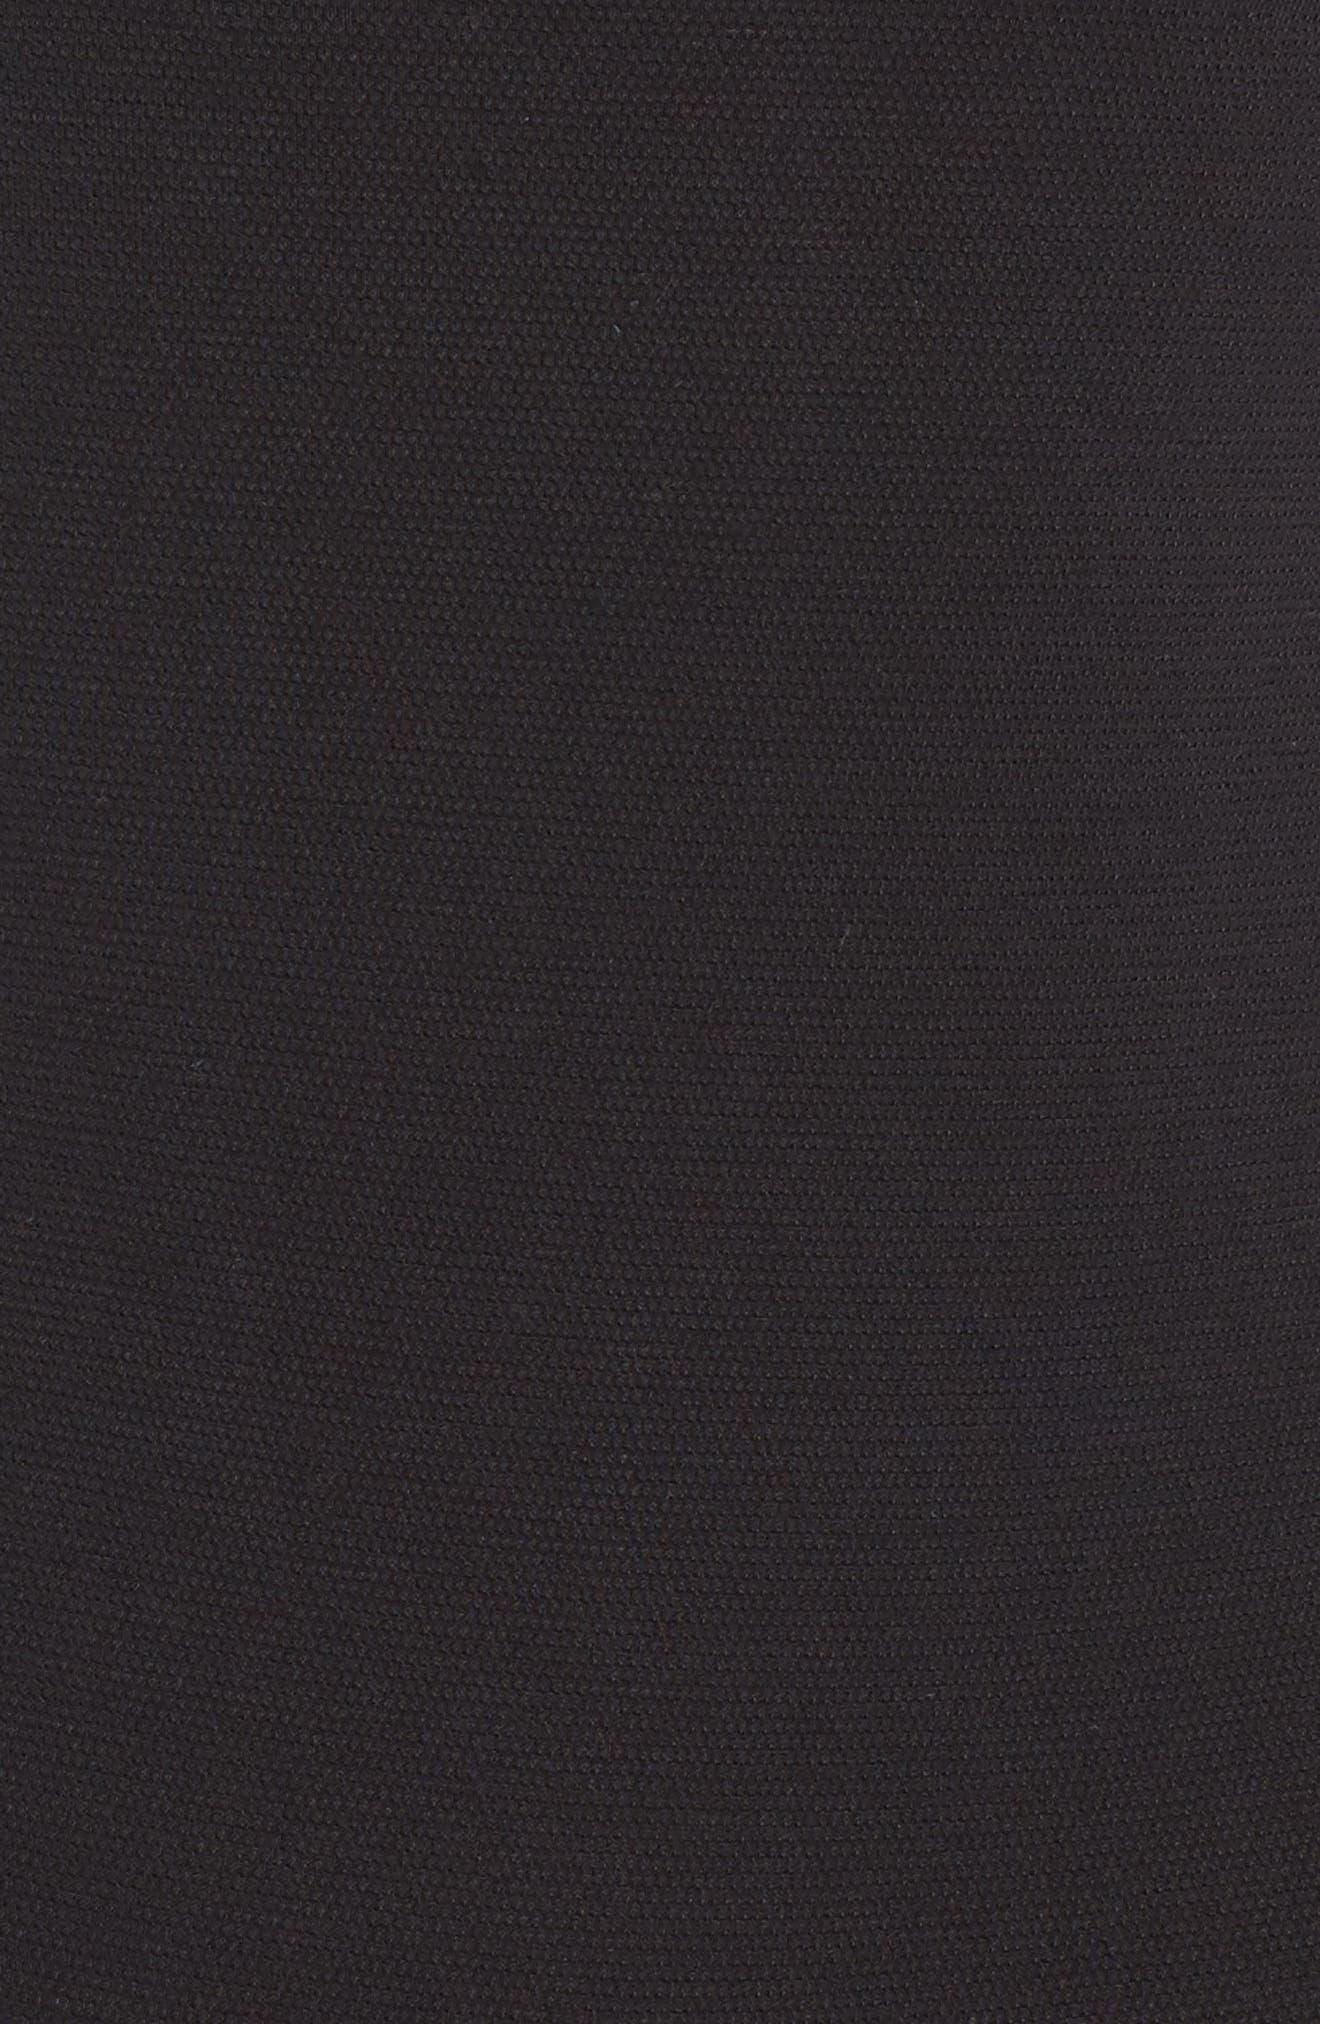 Thong Bodysuit,                             Alternate thumbnail 5, color,                             BLACK